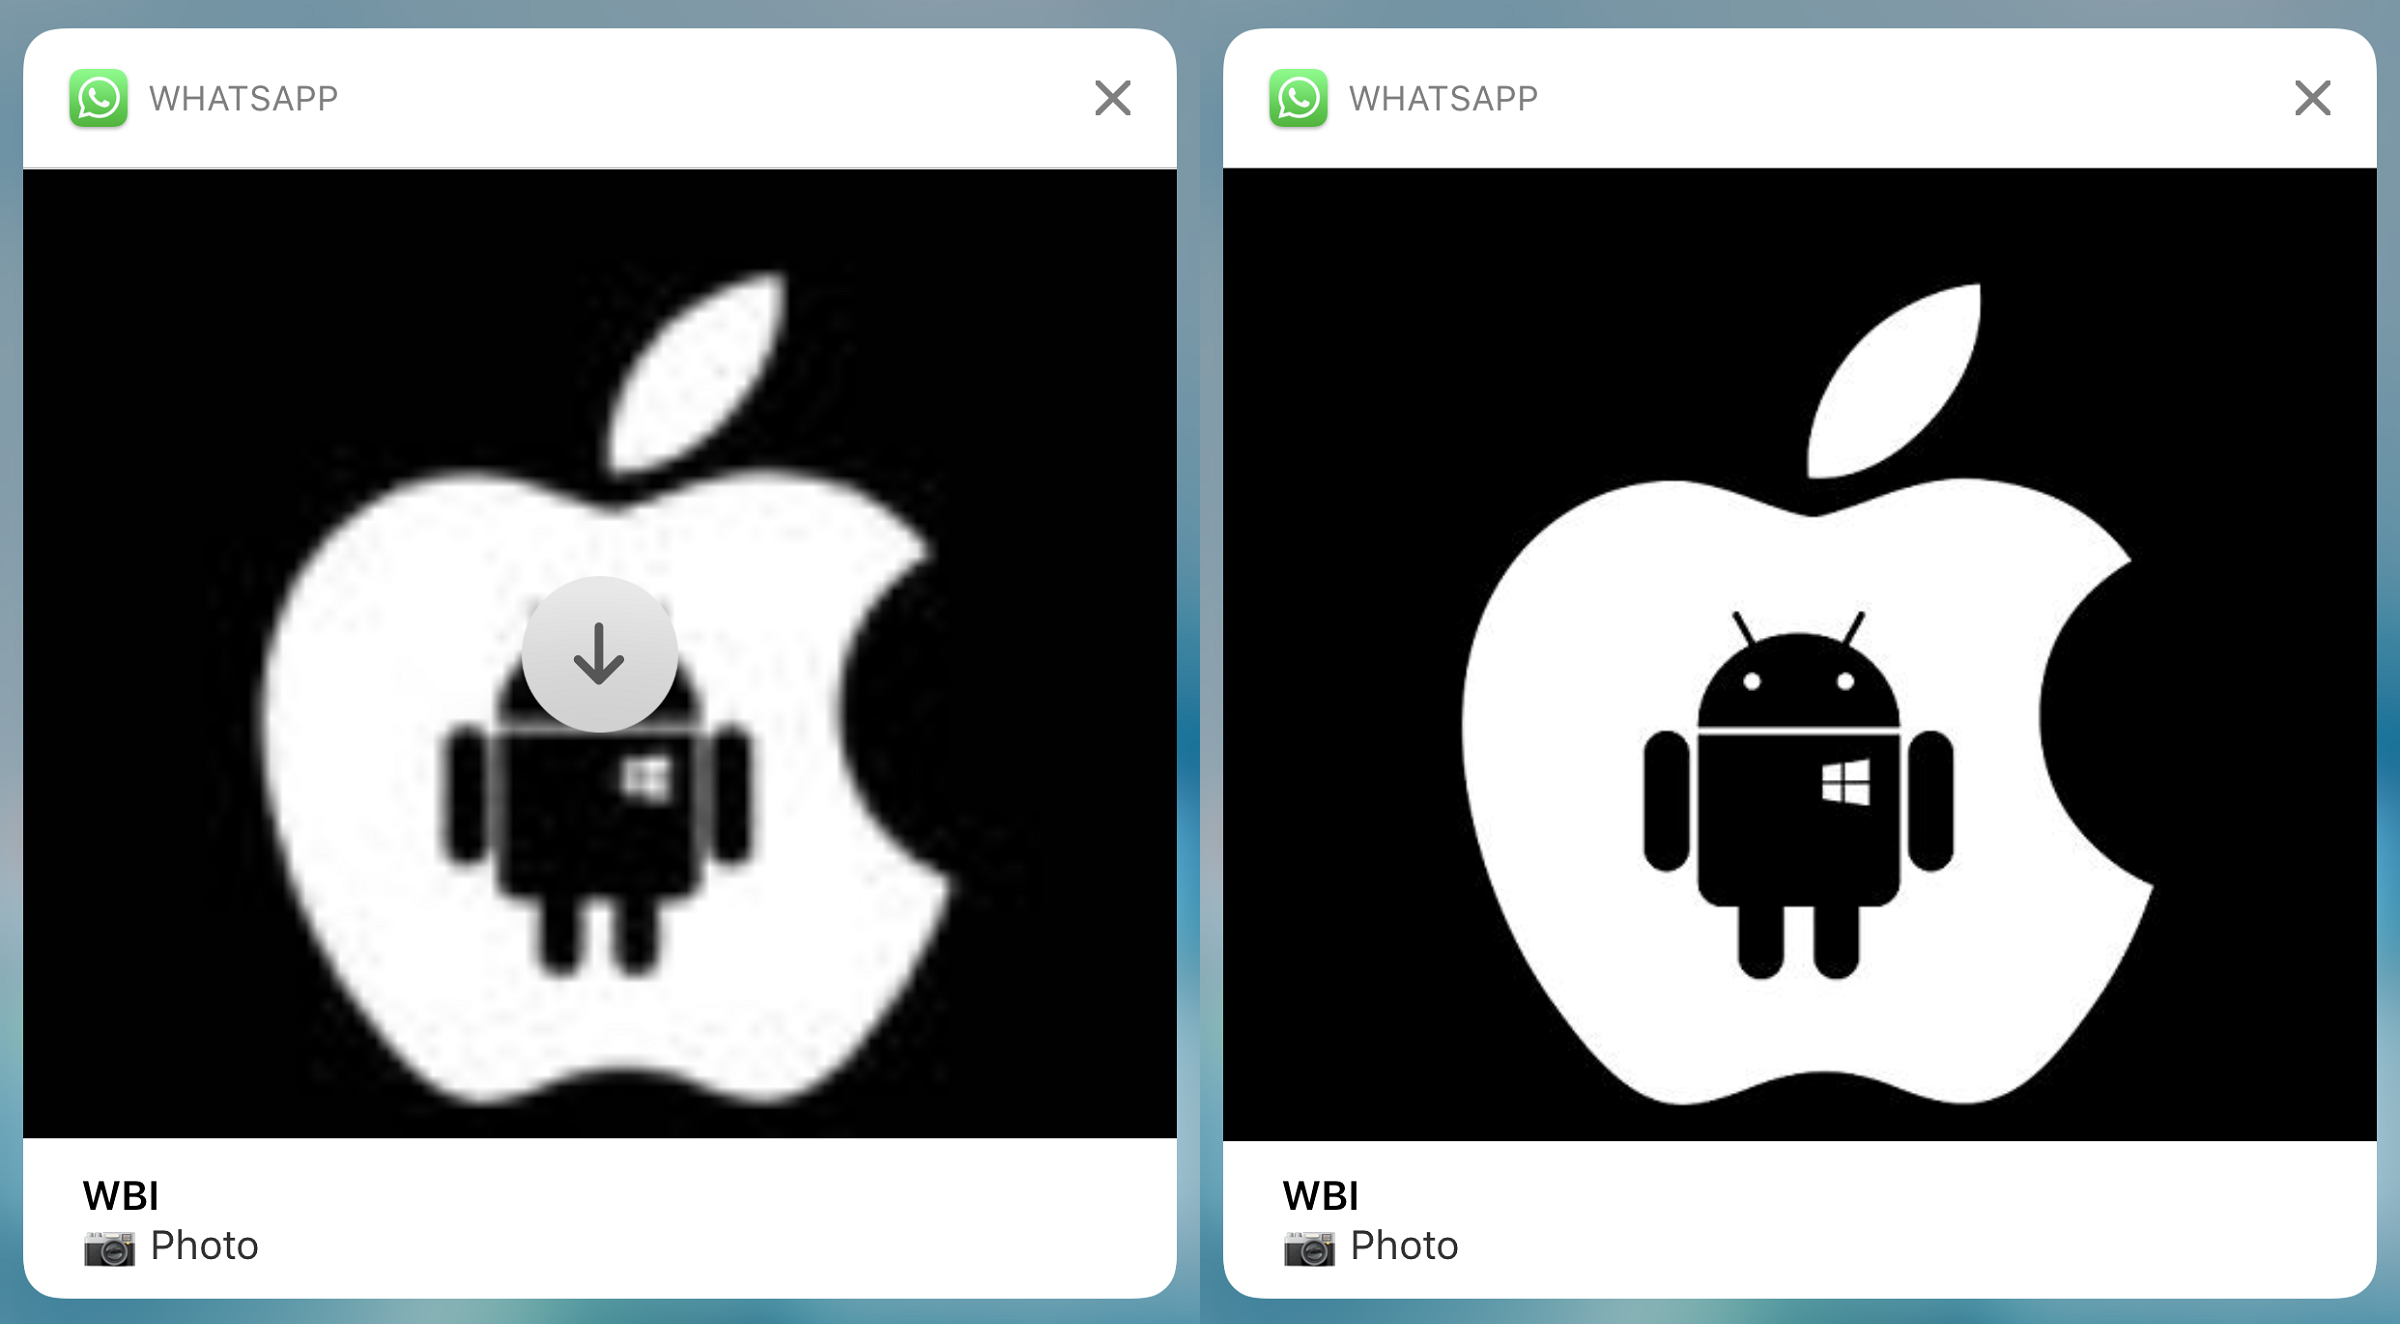 WhatsApp Notification iOS 11 2.18.90 (2)